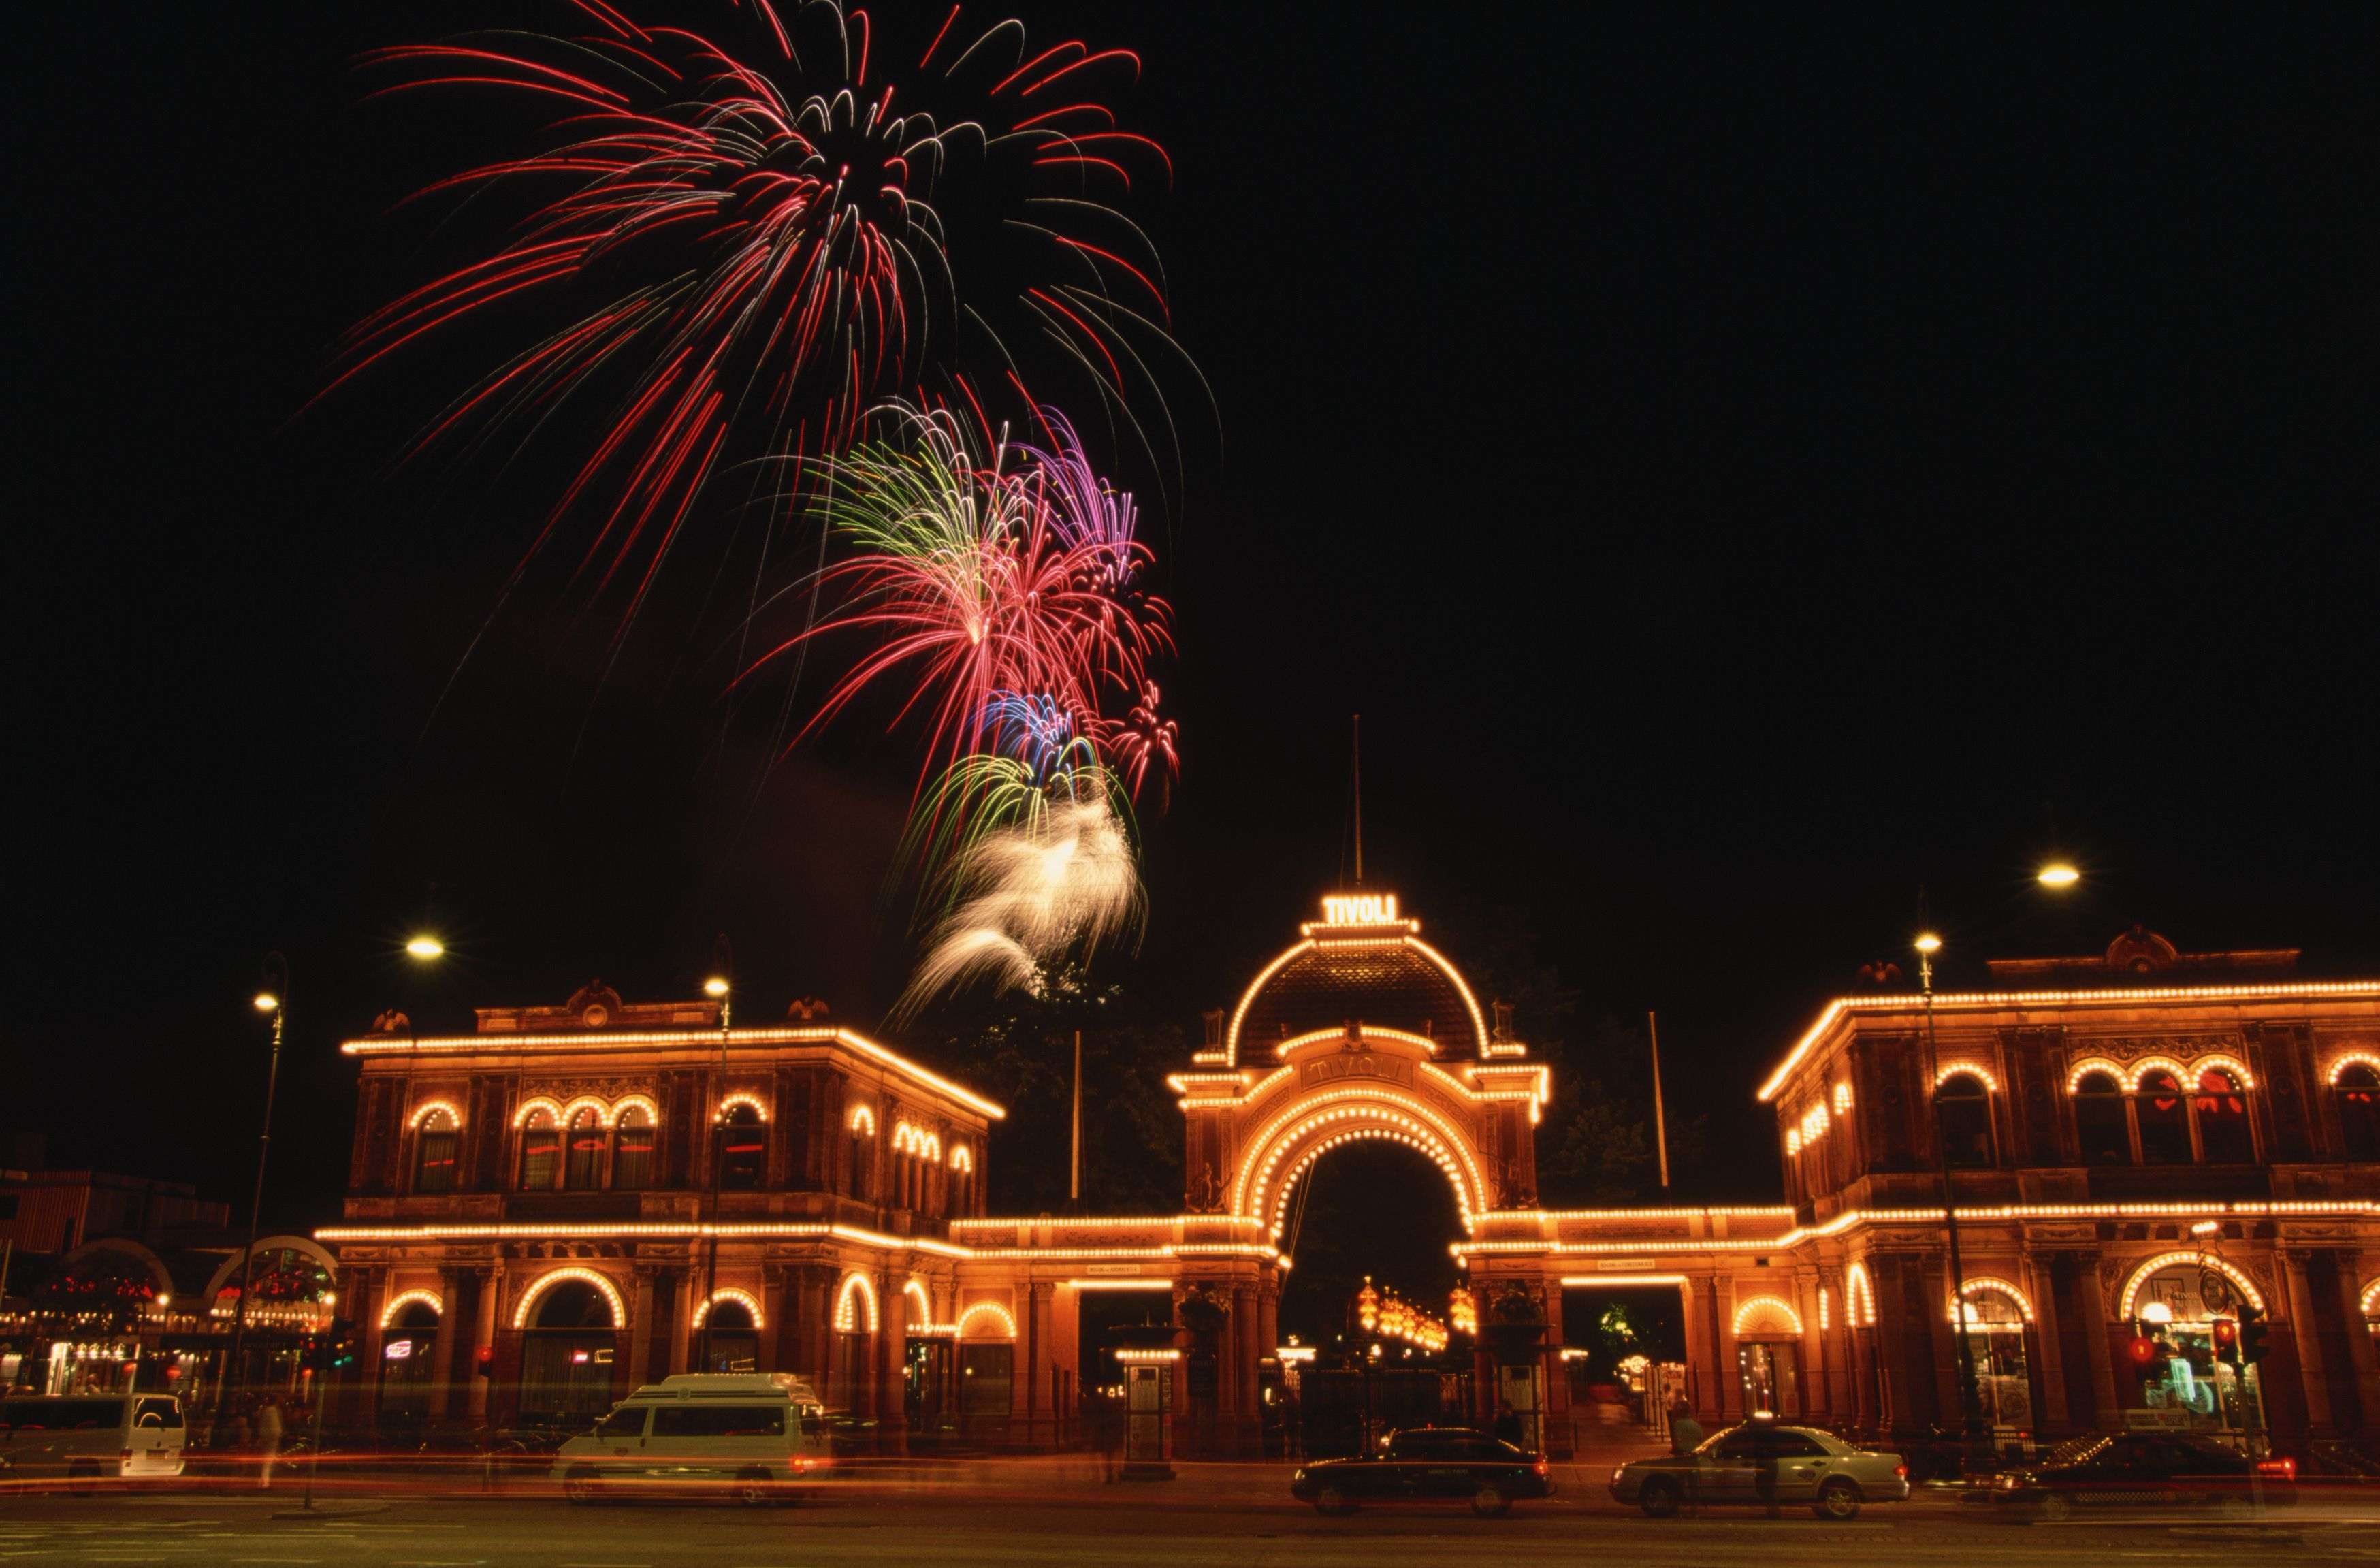 Firework Display Over Tivoli Gardens